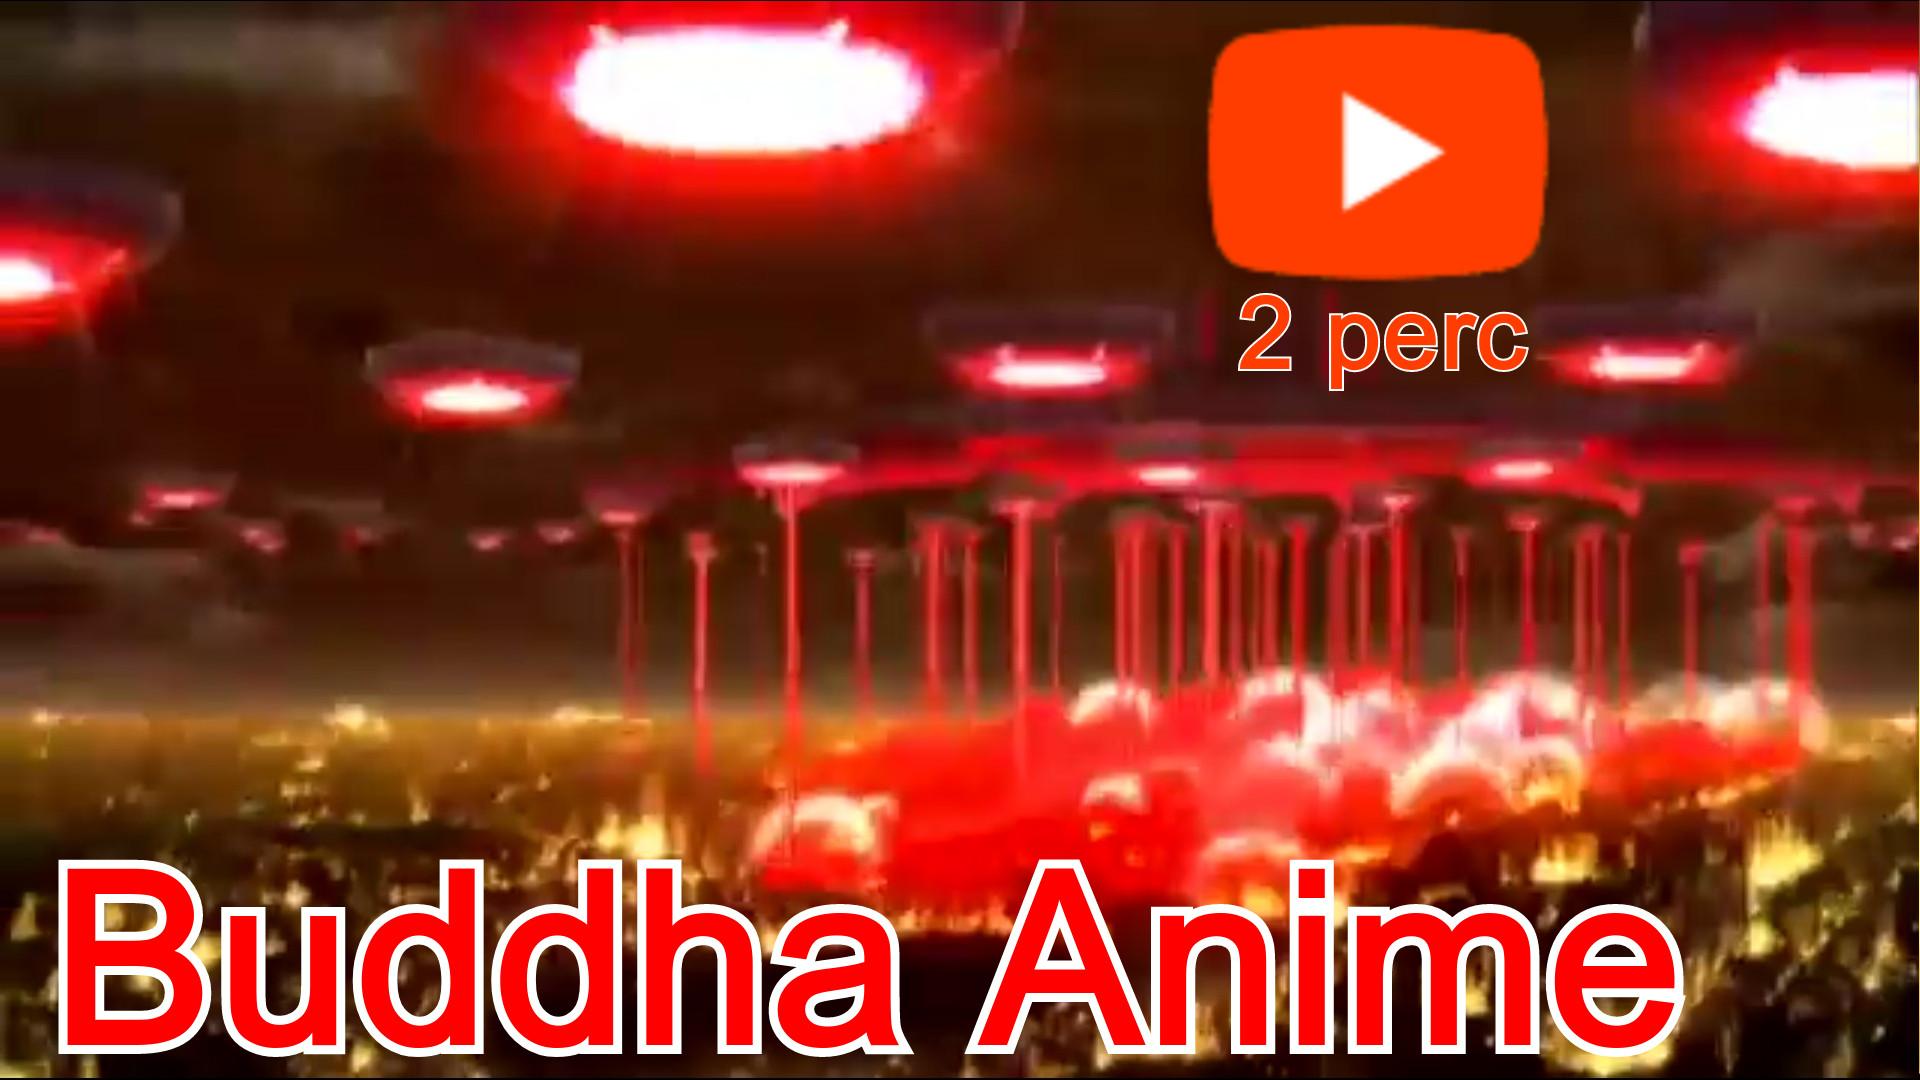 BuddhaReinkarnációs Anime